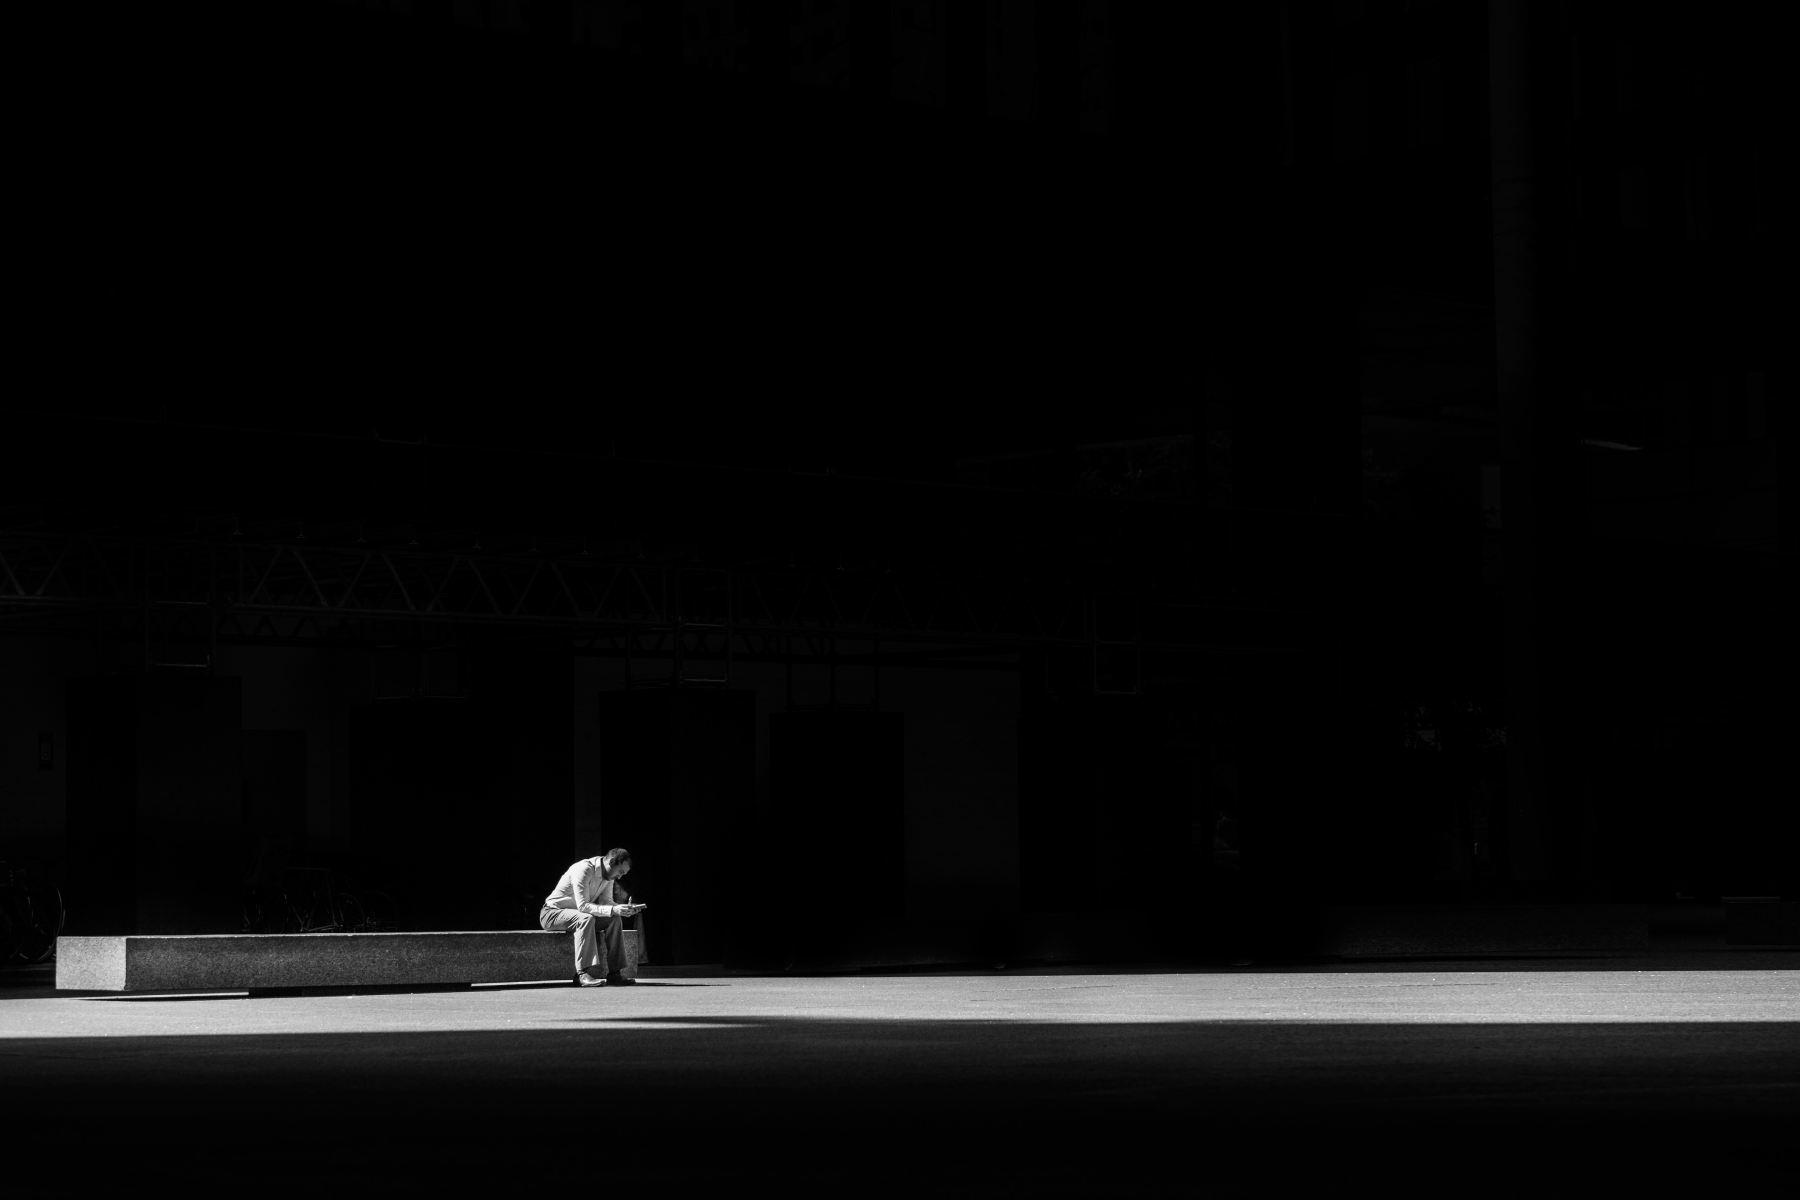 man sitting alone on concrete bench